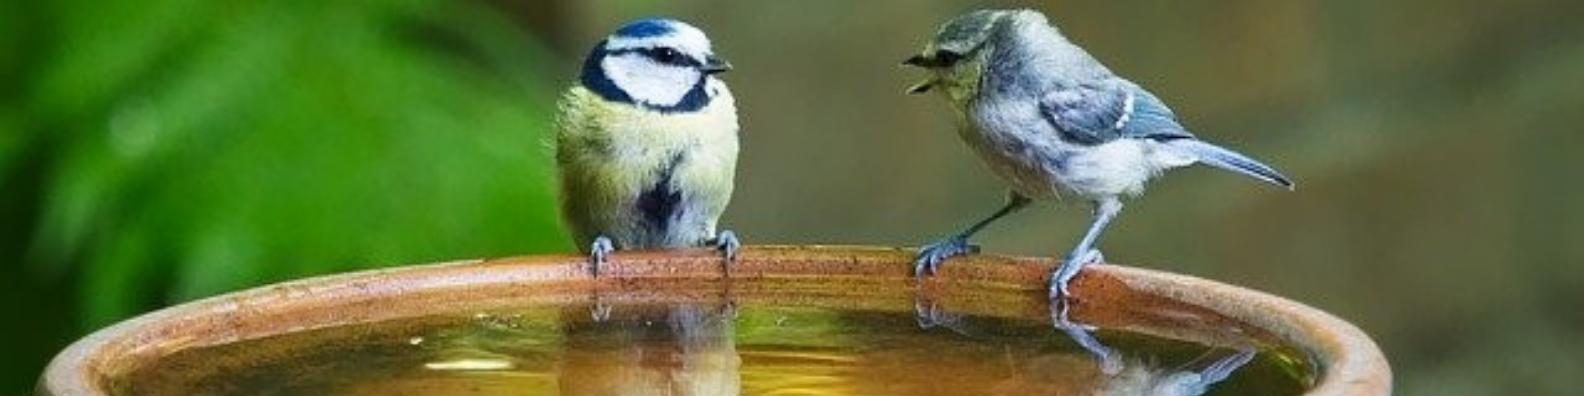 Two birds facing each other in a bird bath.